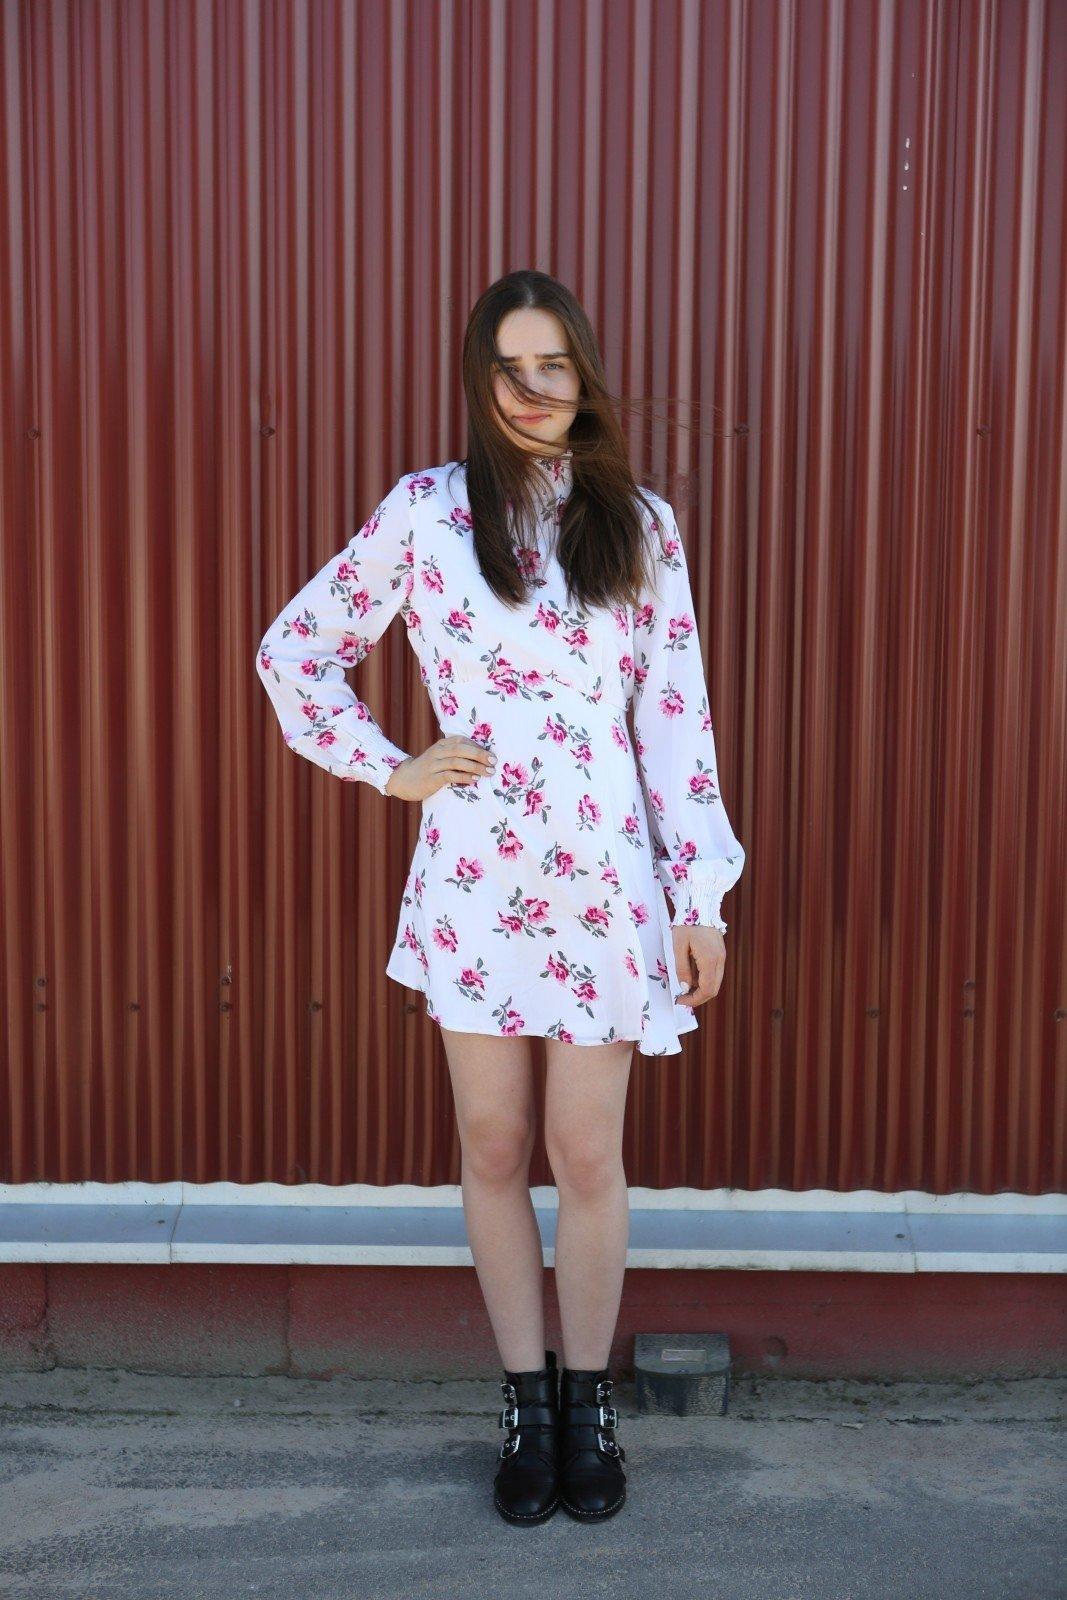 Gėlėta suknelė – 4 eurai